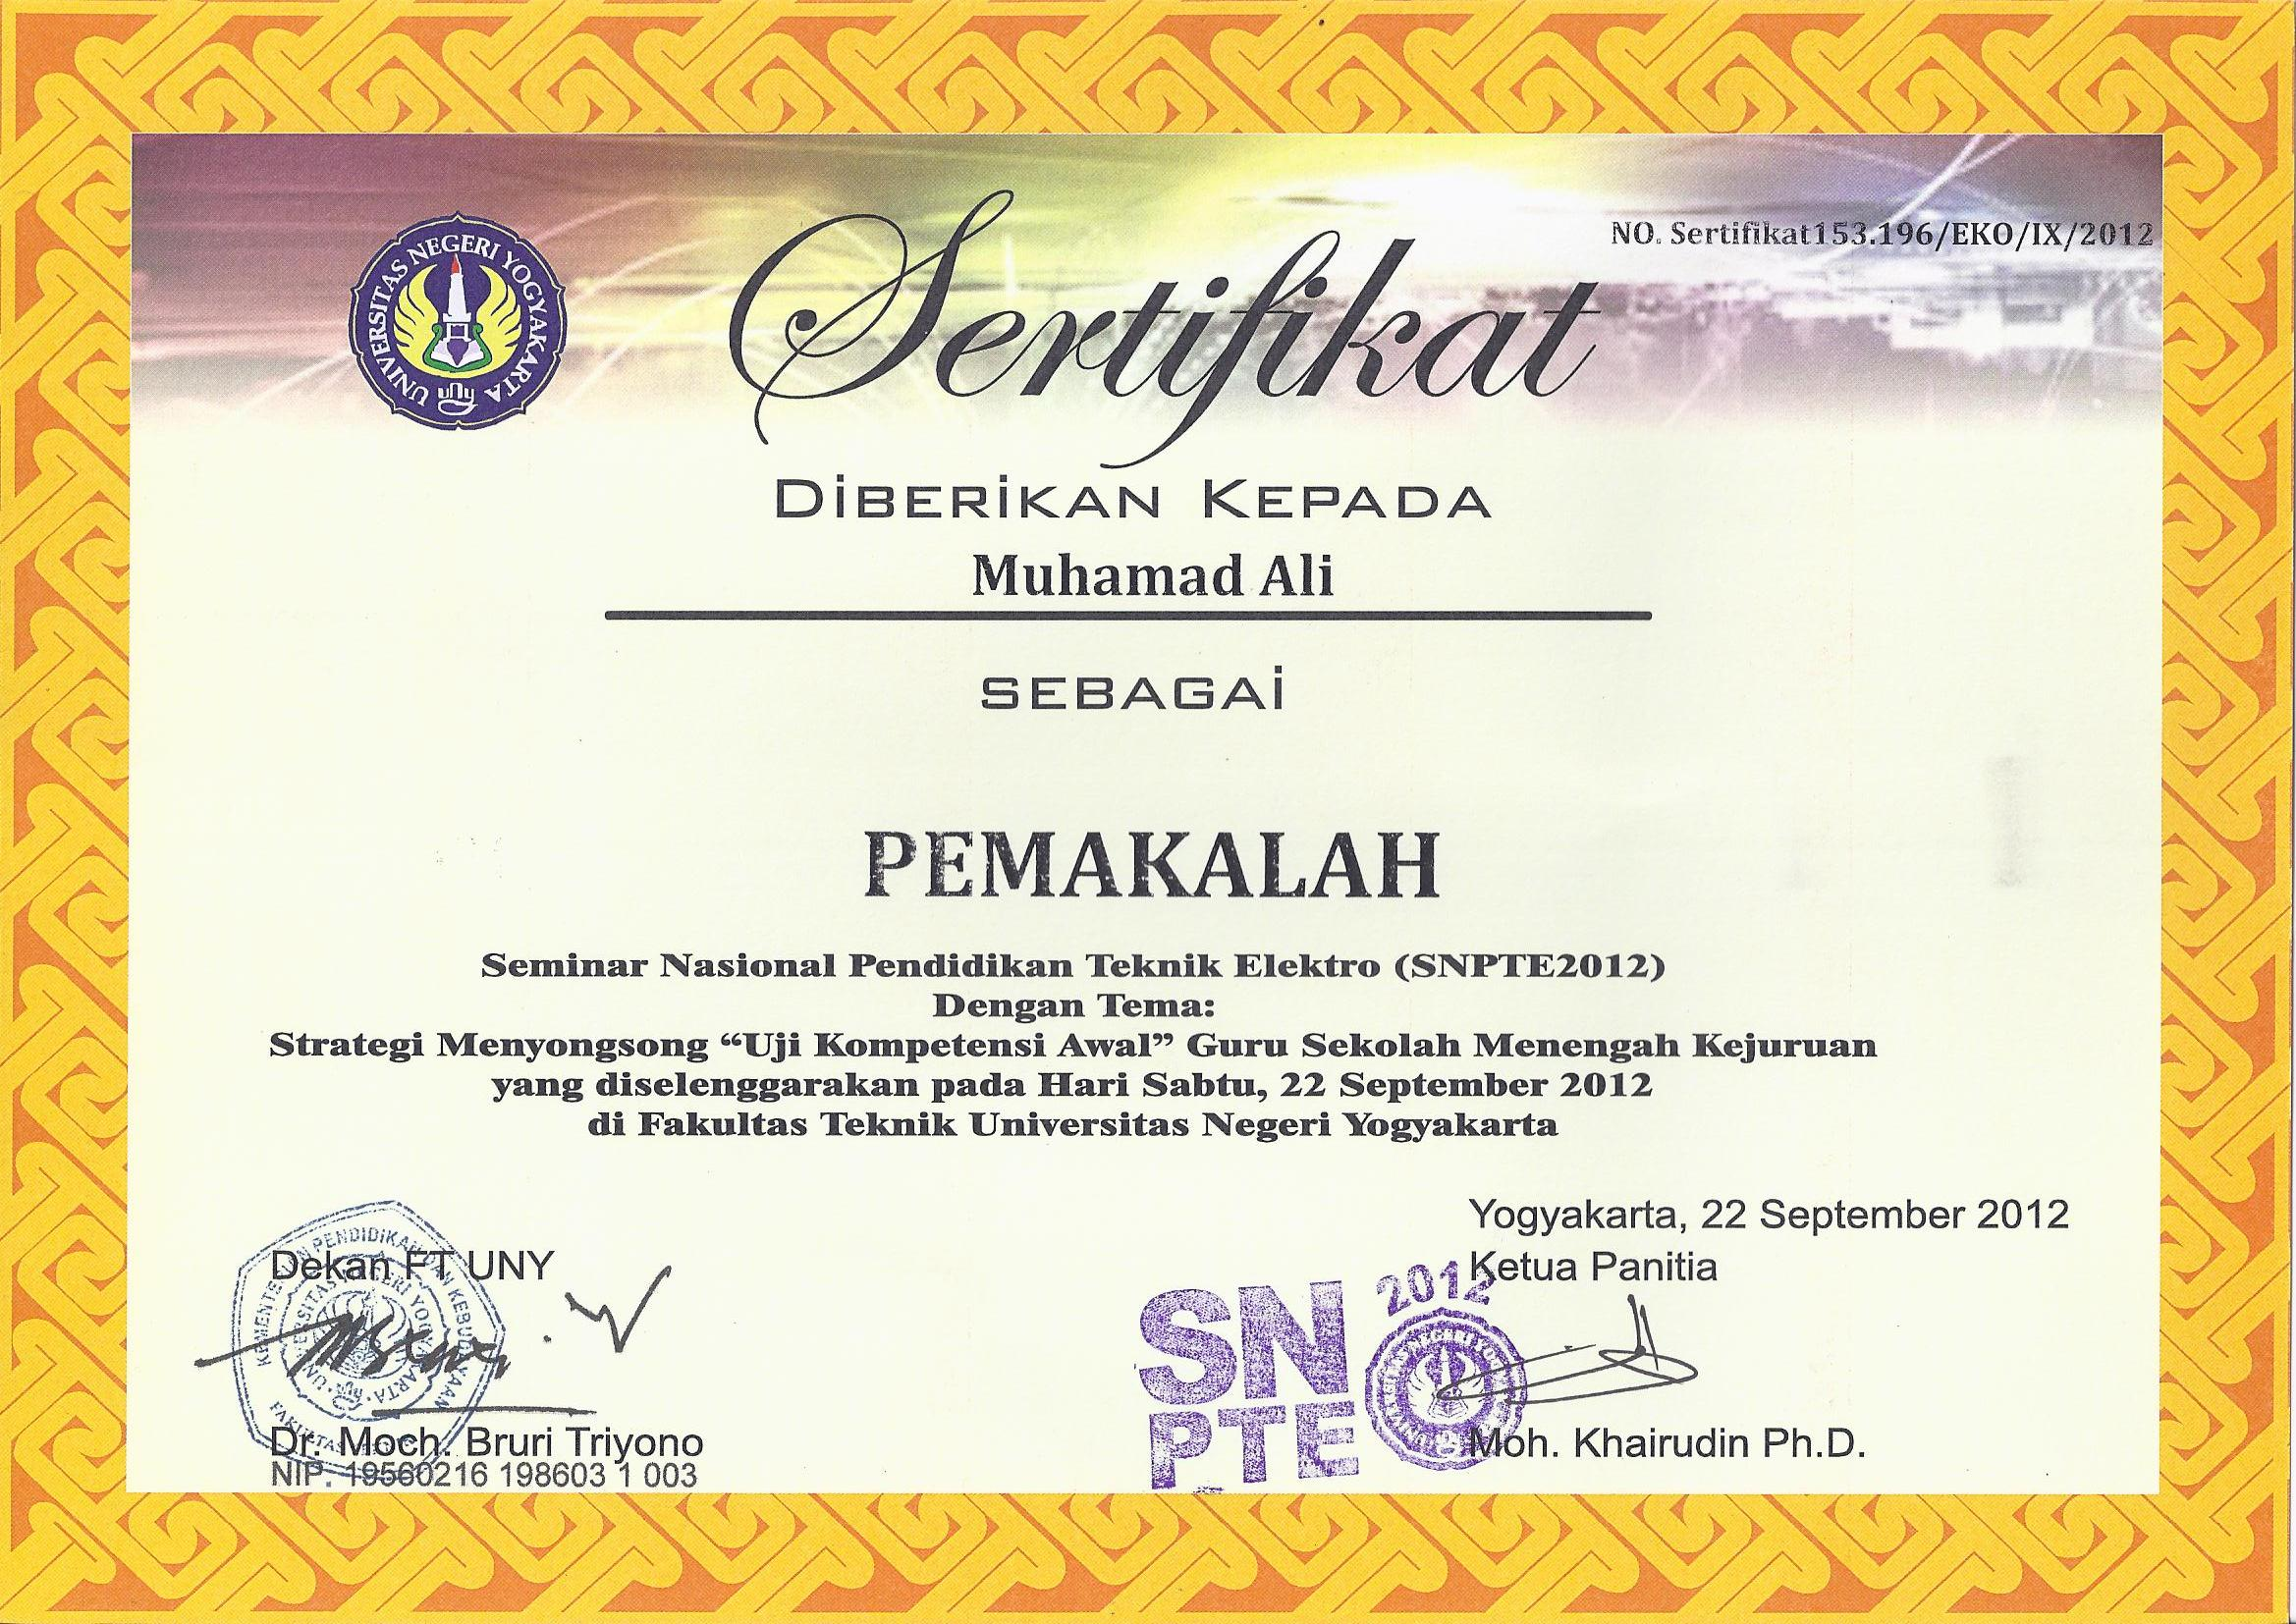 Contoh Silabus Smk Elektro Struktur Organisasi Magister Of Civil Engineering Muhamad Ali St M